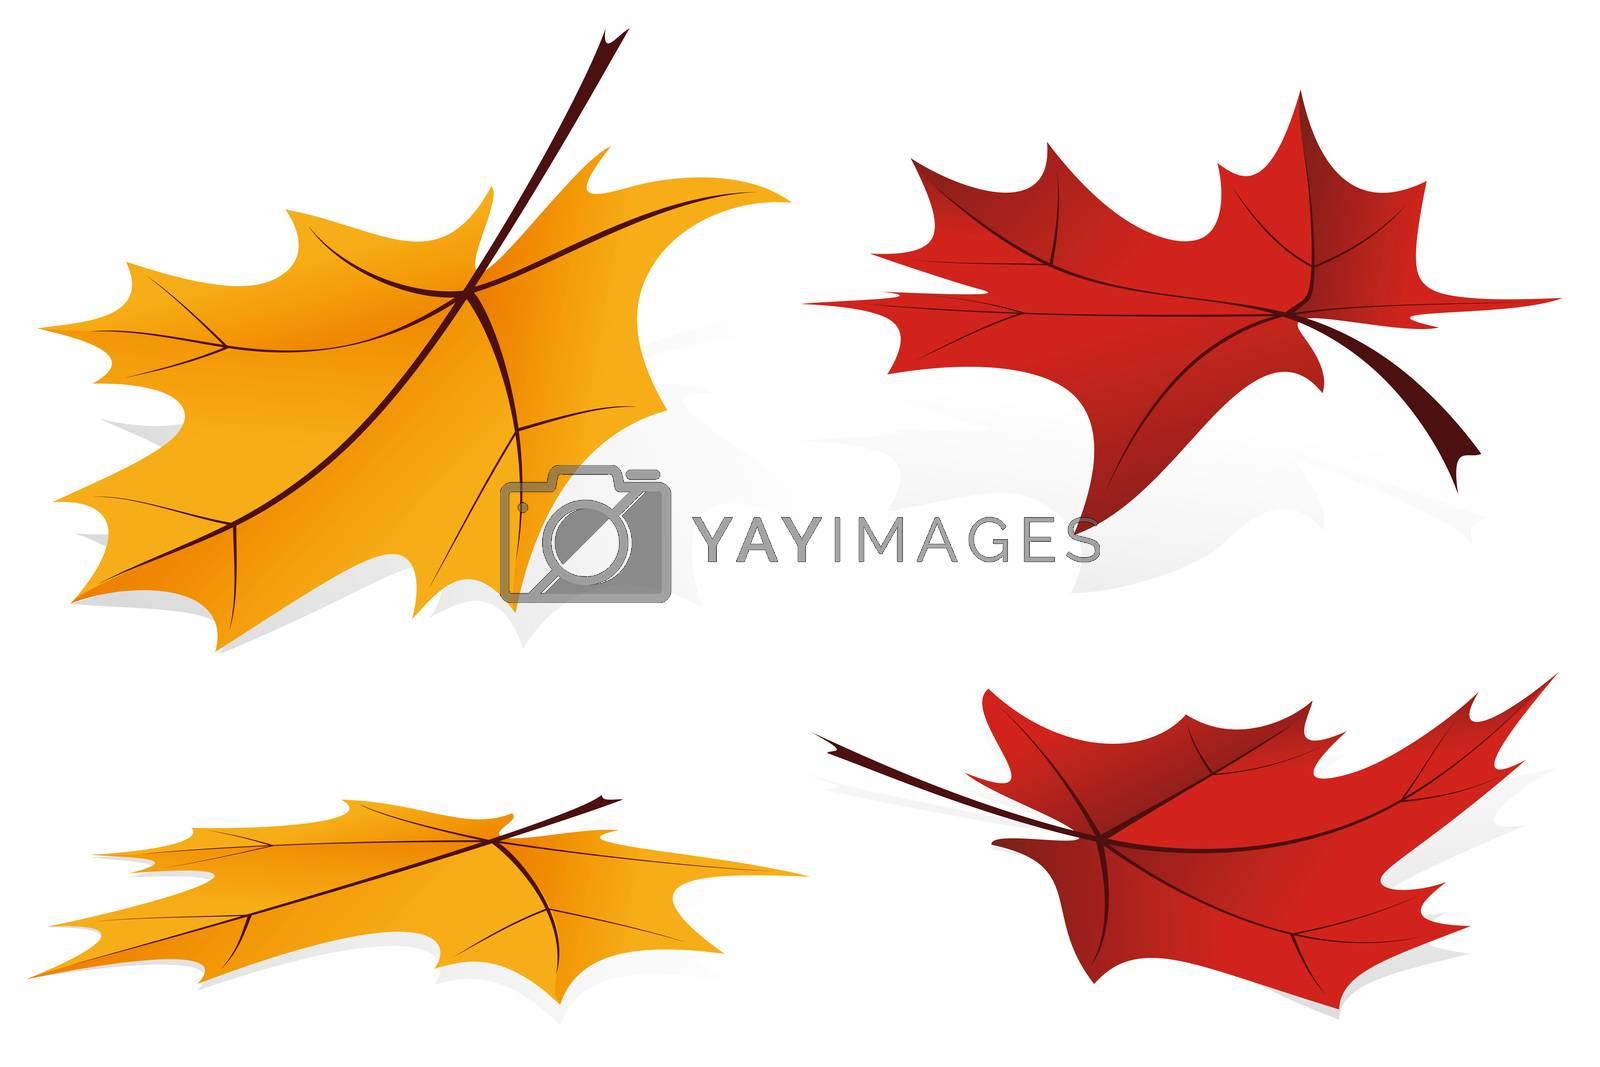 Falling leafs icon set by WaD